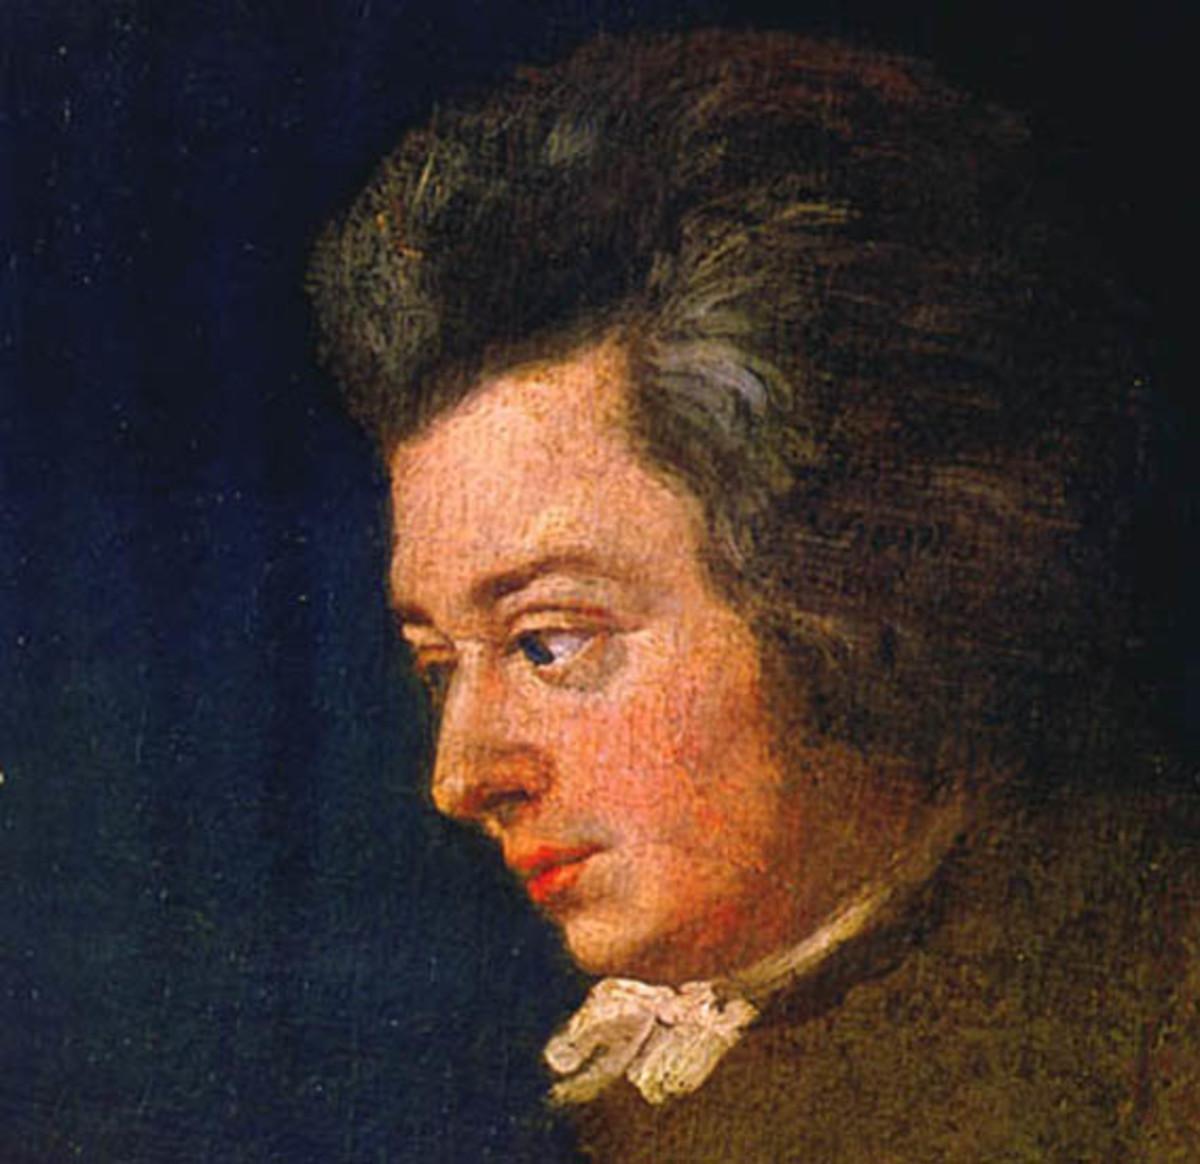 For Epileptics, Mozart May Be Medicinal